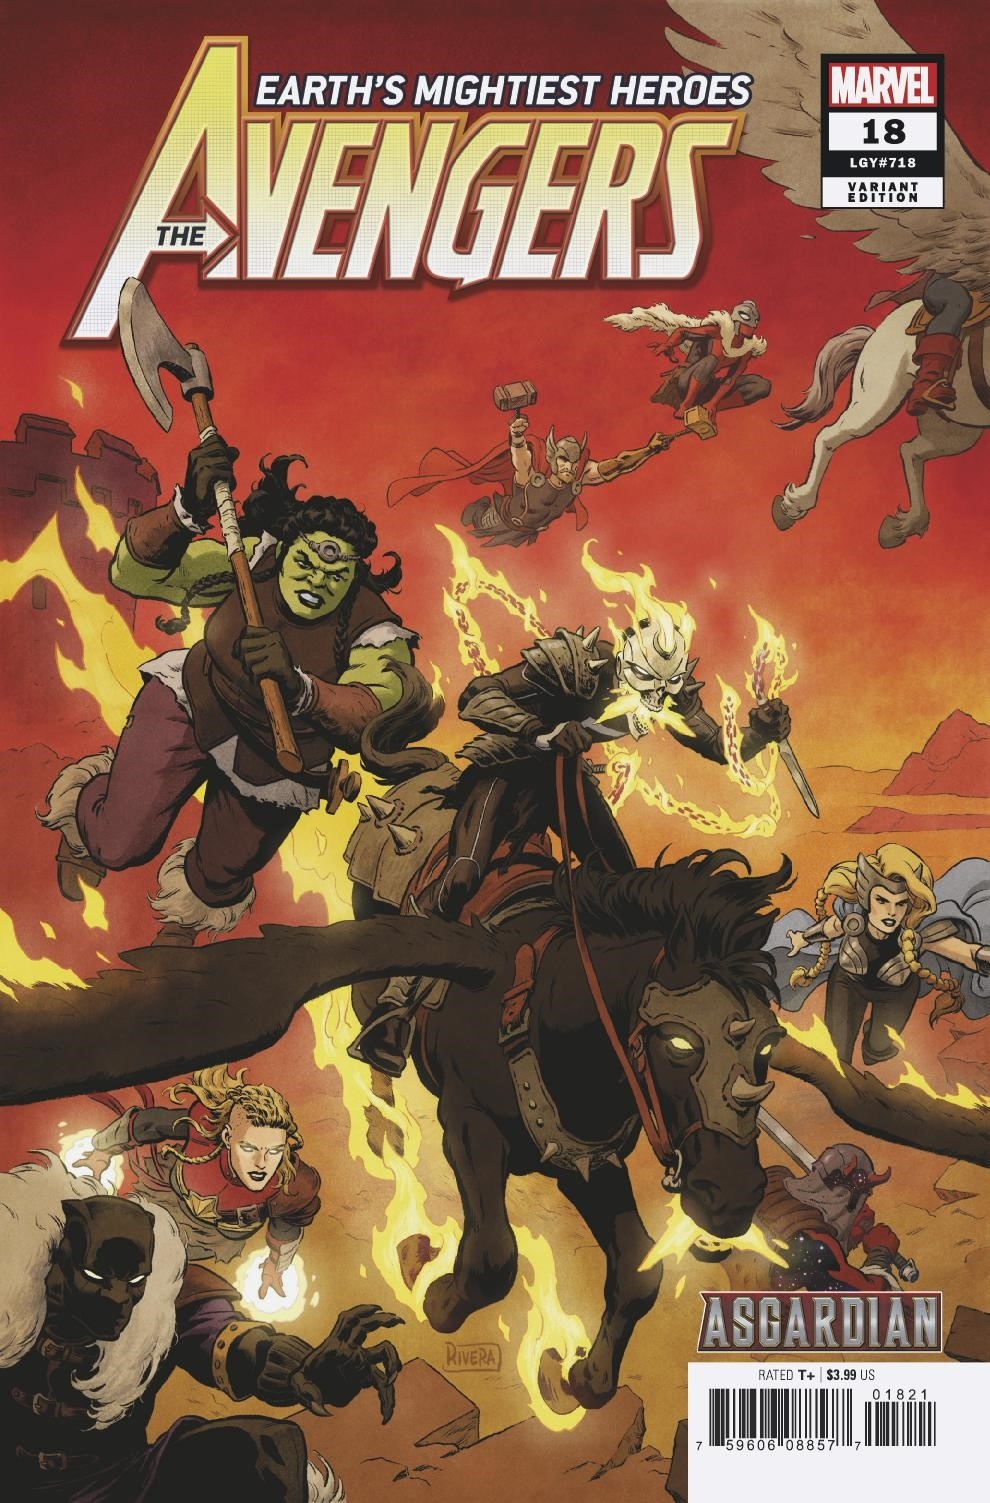 Avengers Vol 8 18 Asgardian Variant.jpg